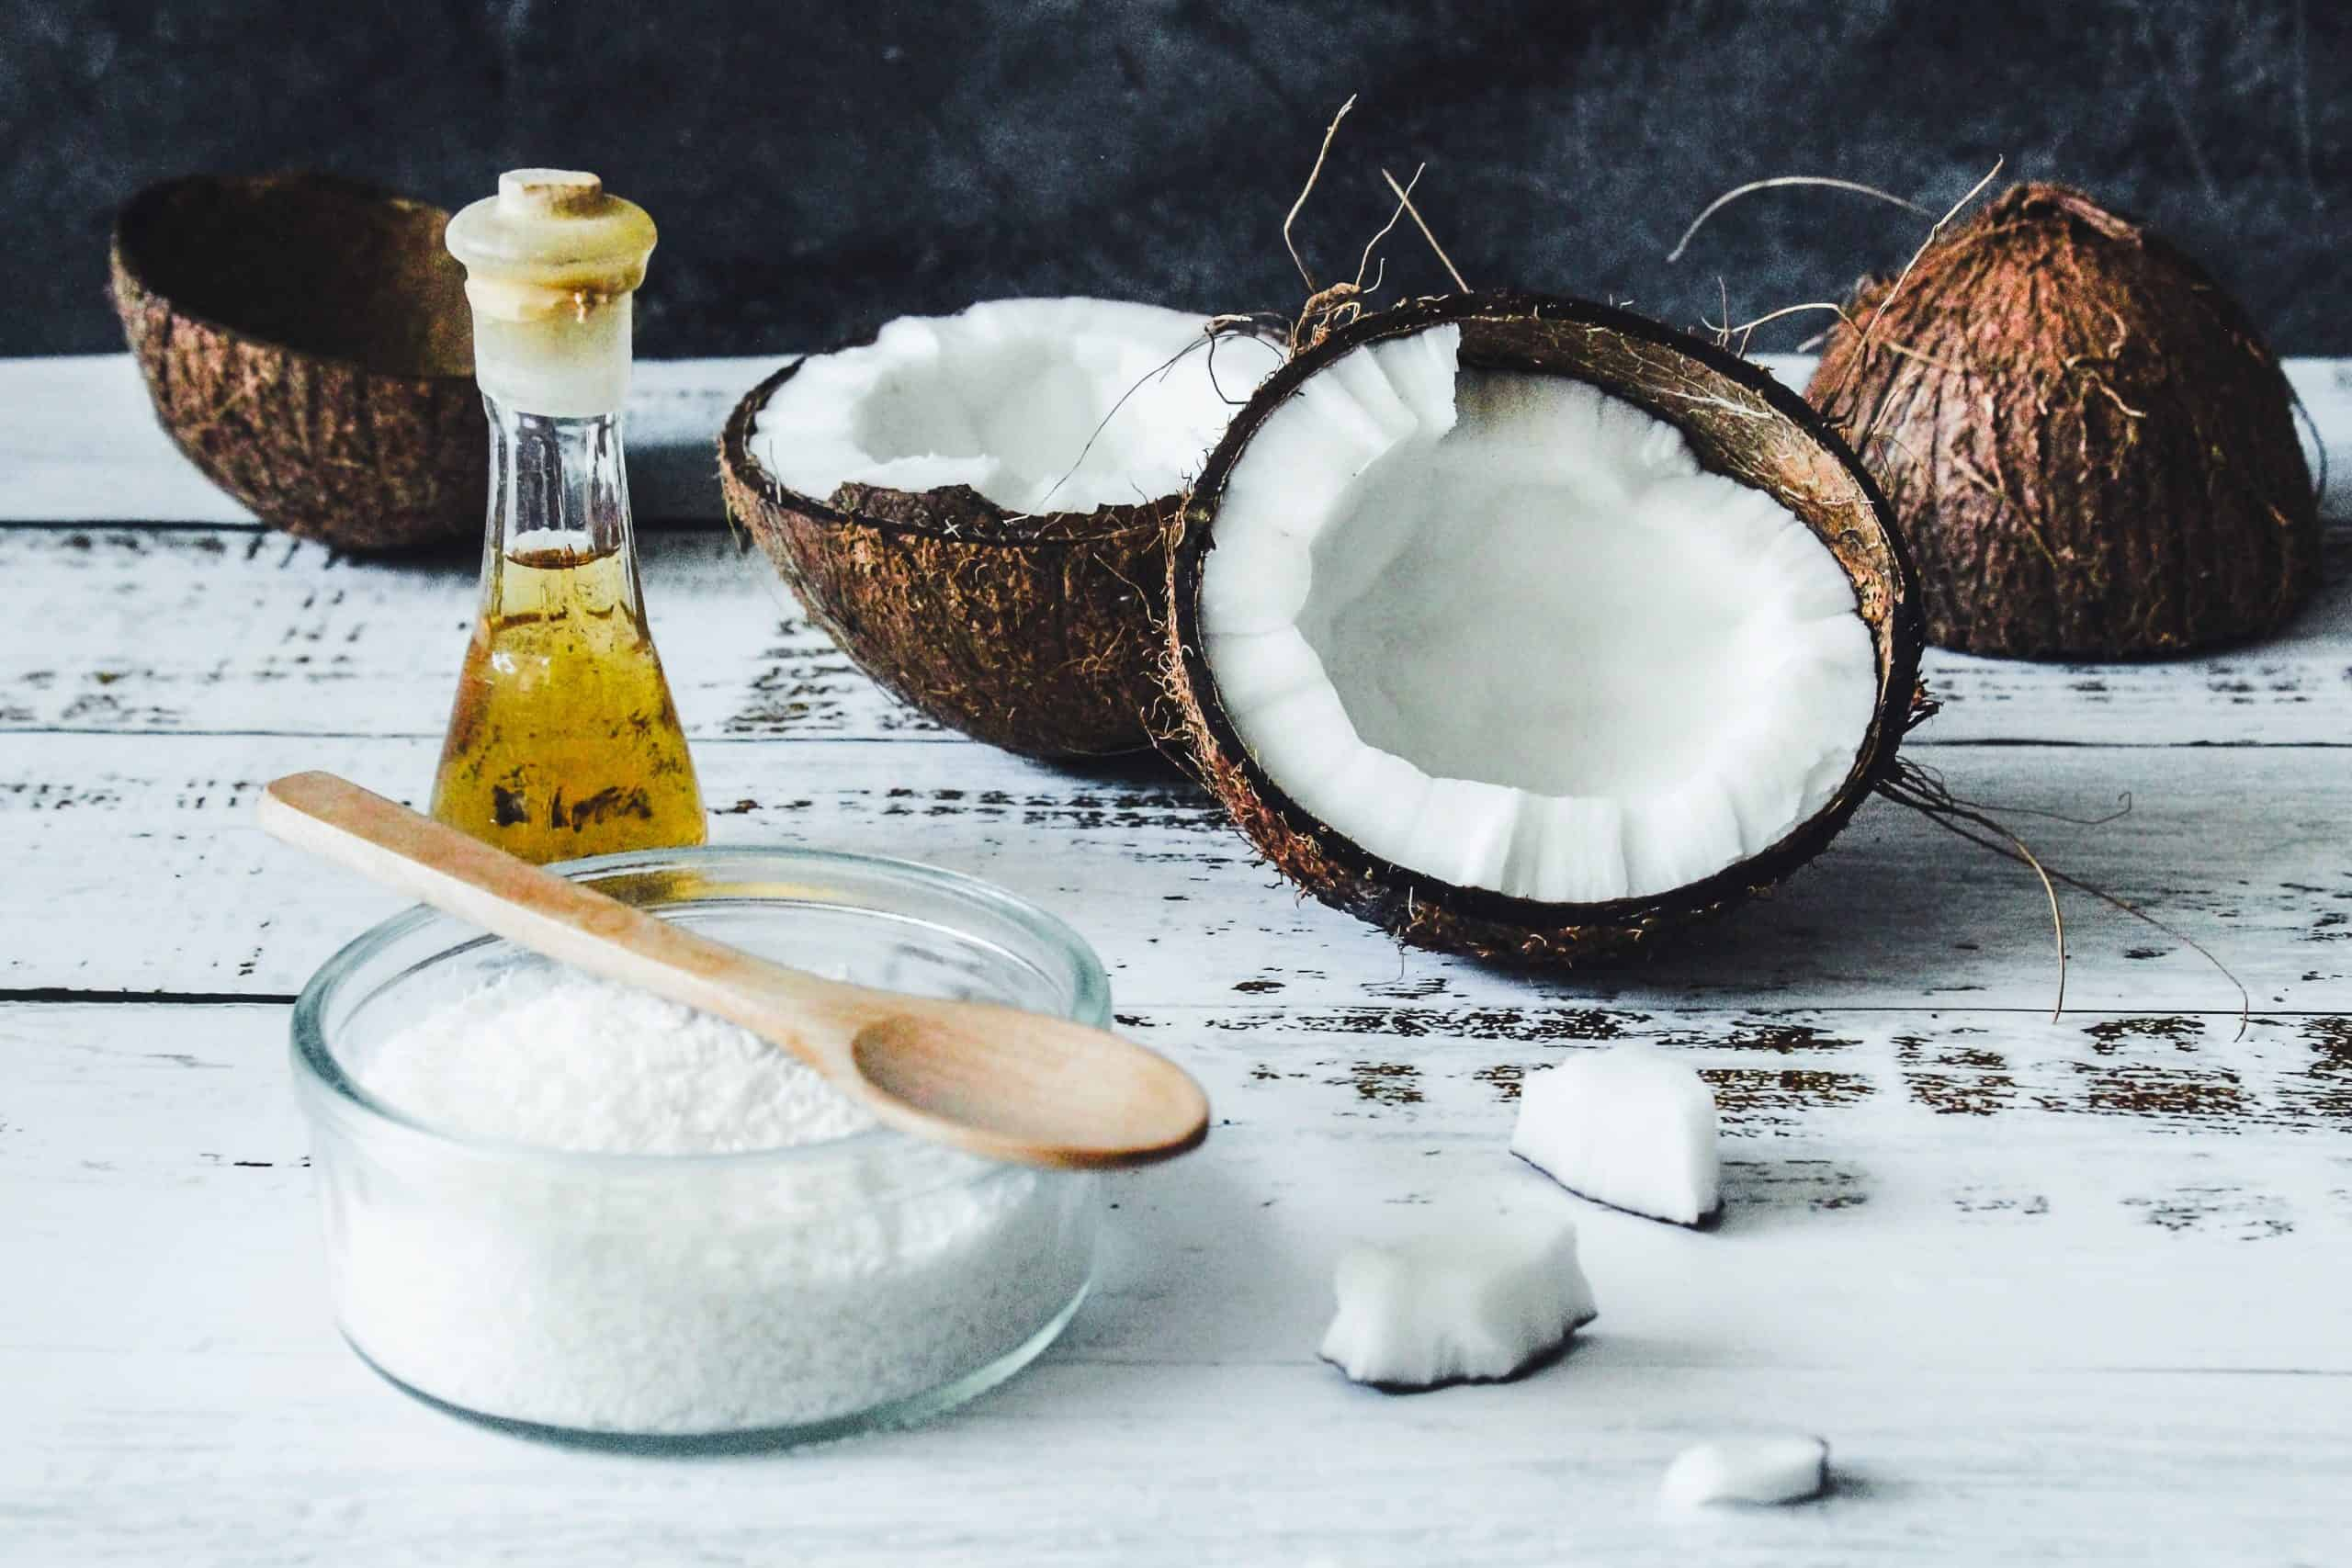 an image of a split open coconut